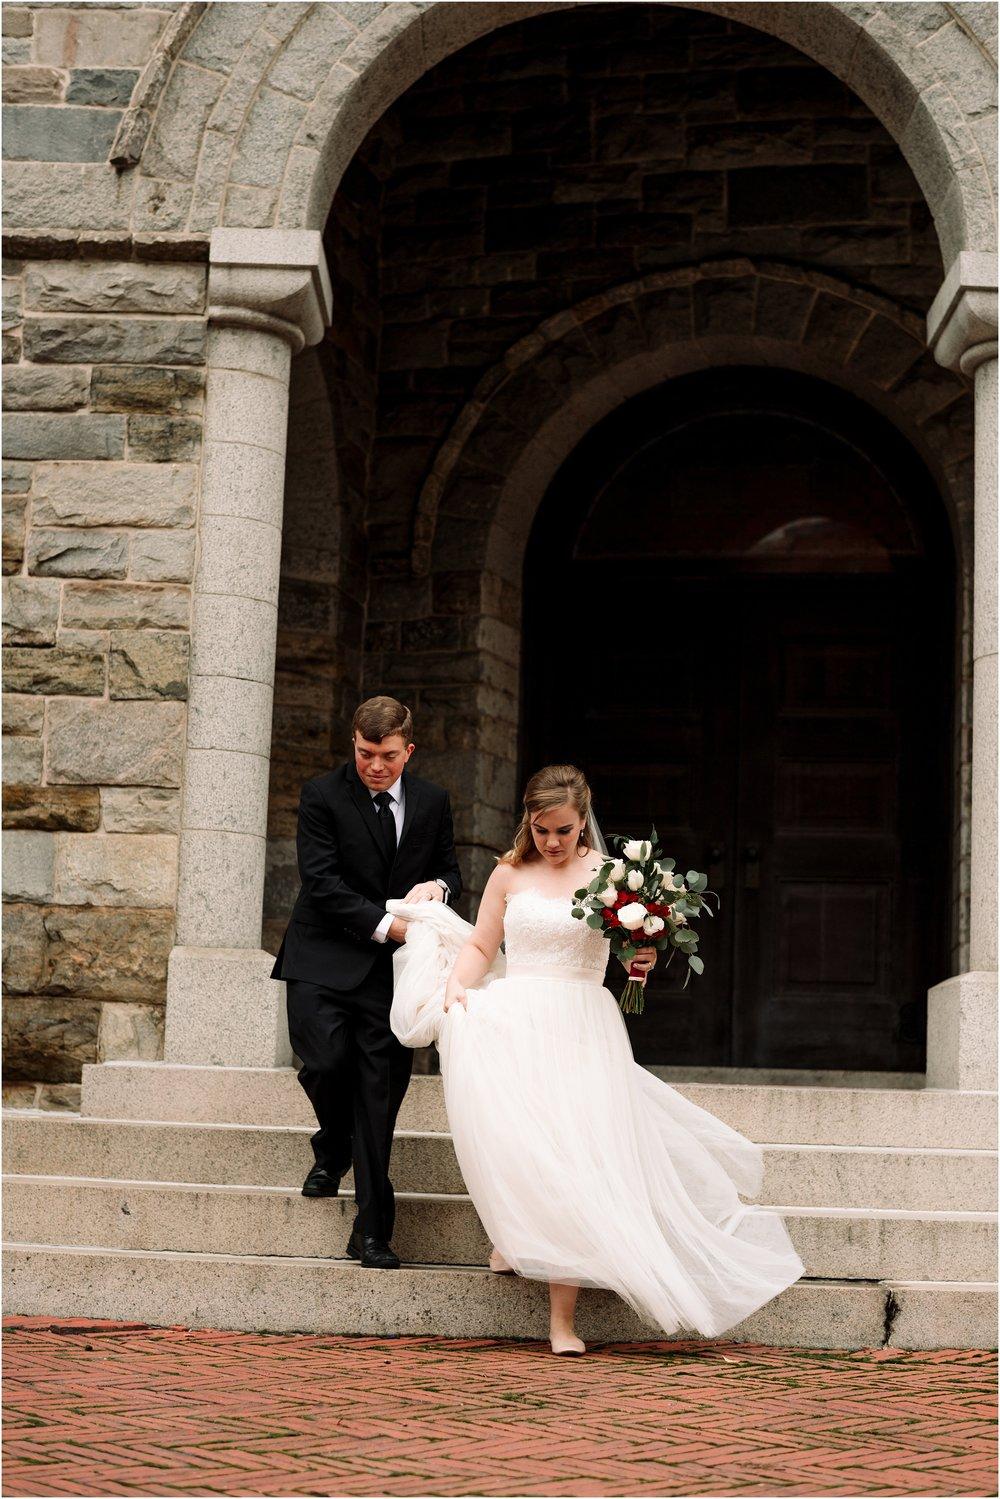 hannah leigh photography downtown Baltimore MD wedding_1805.jpg